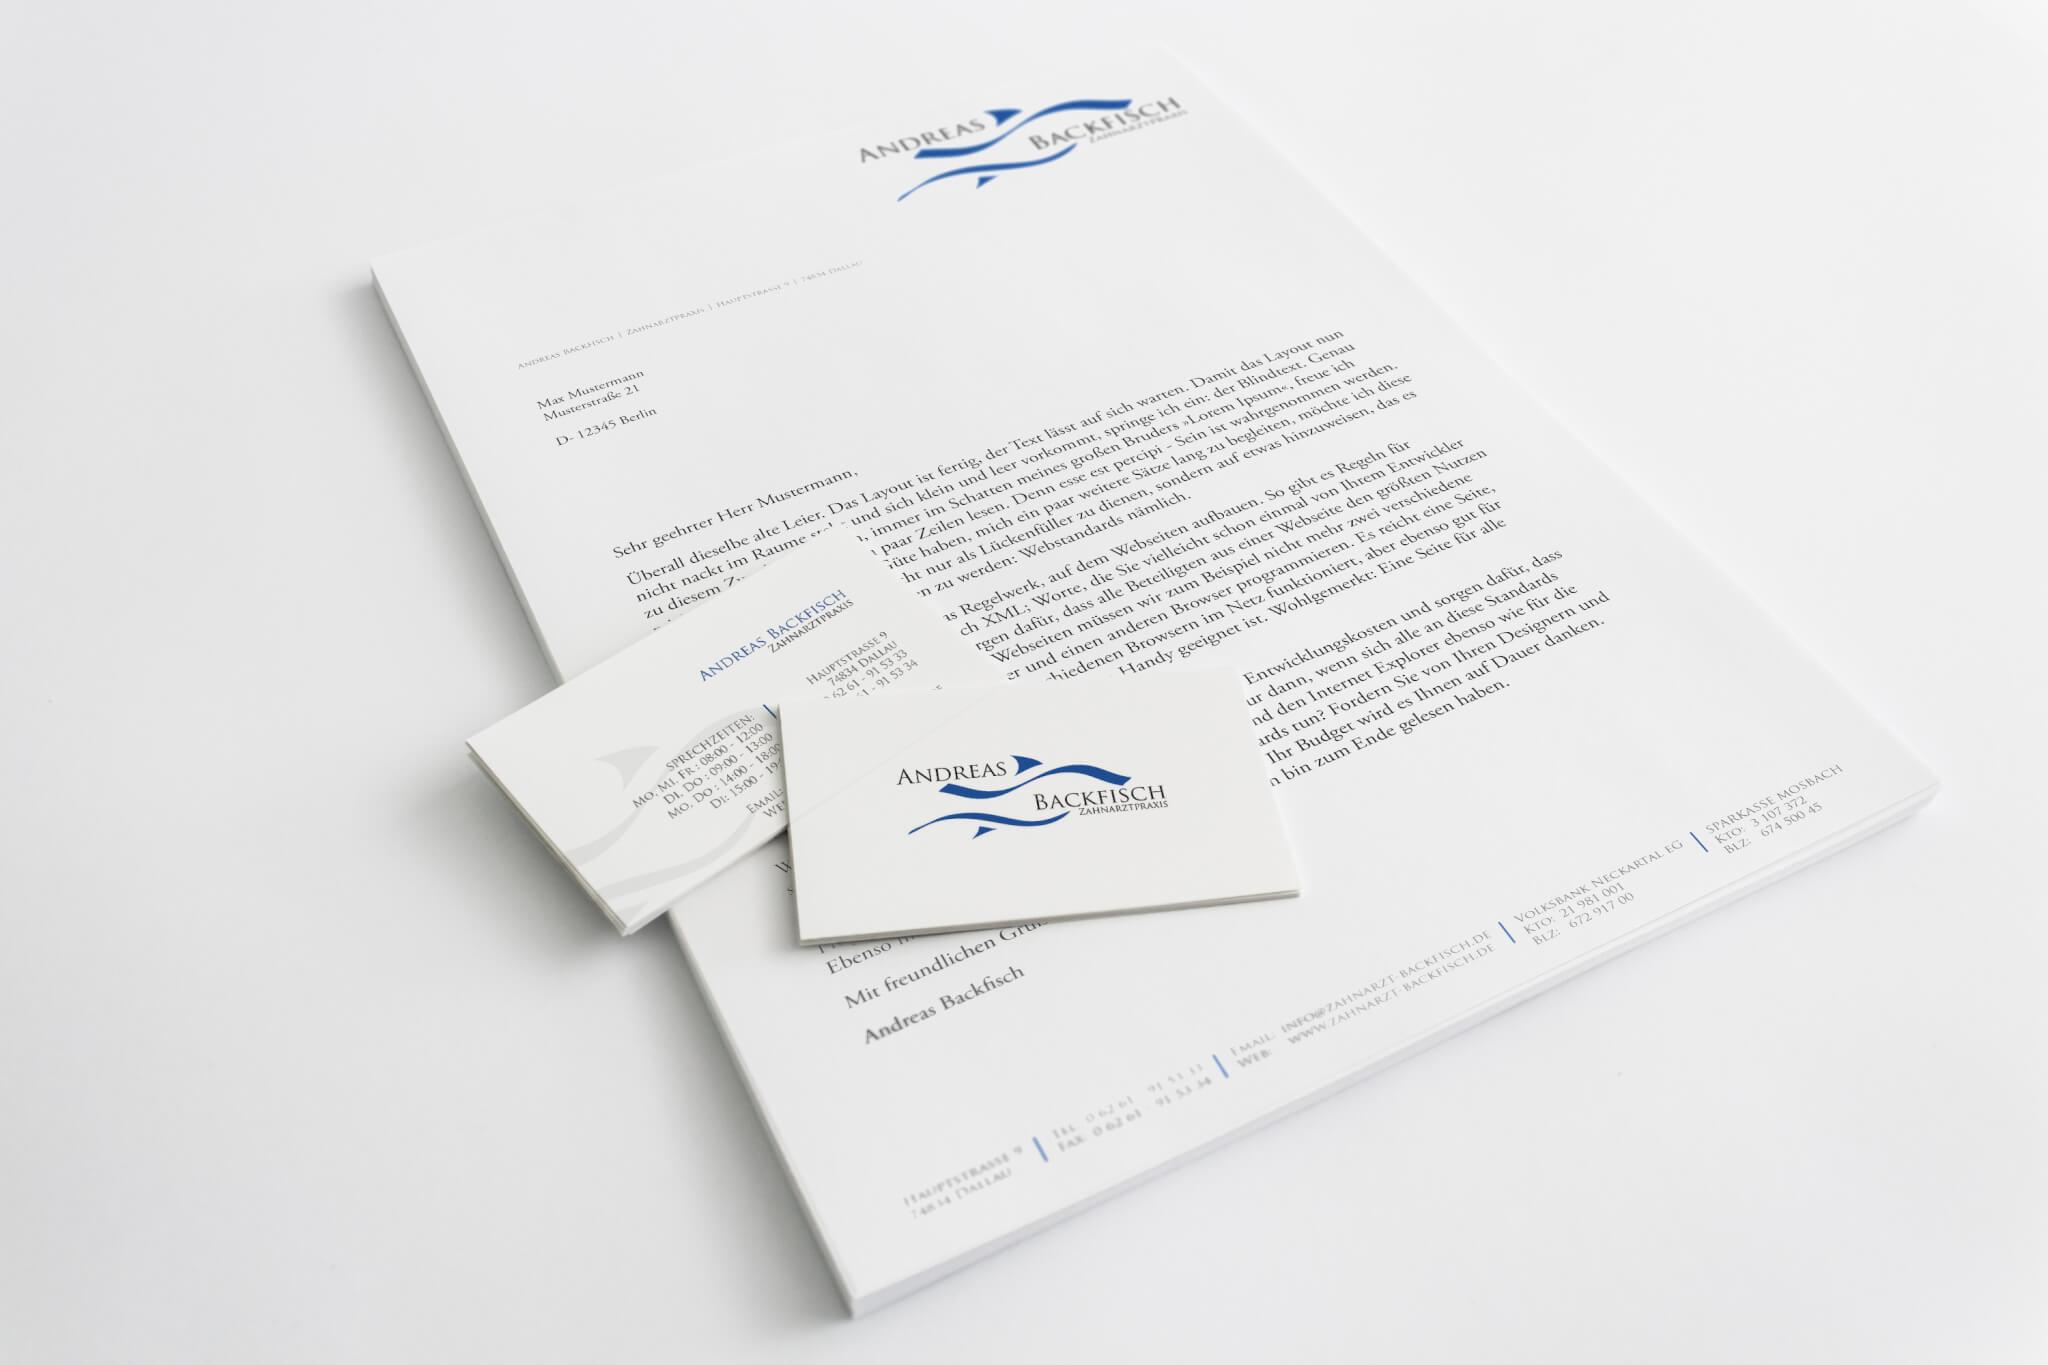 Zahnarzt Backfisch Kleinwerkstatt Freelance Mediadesign